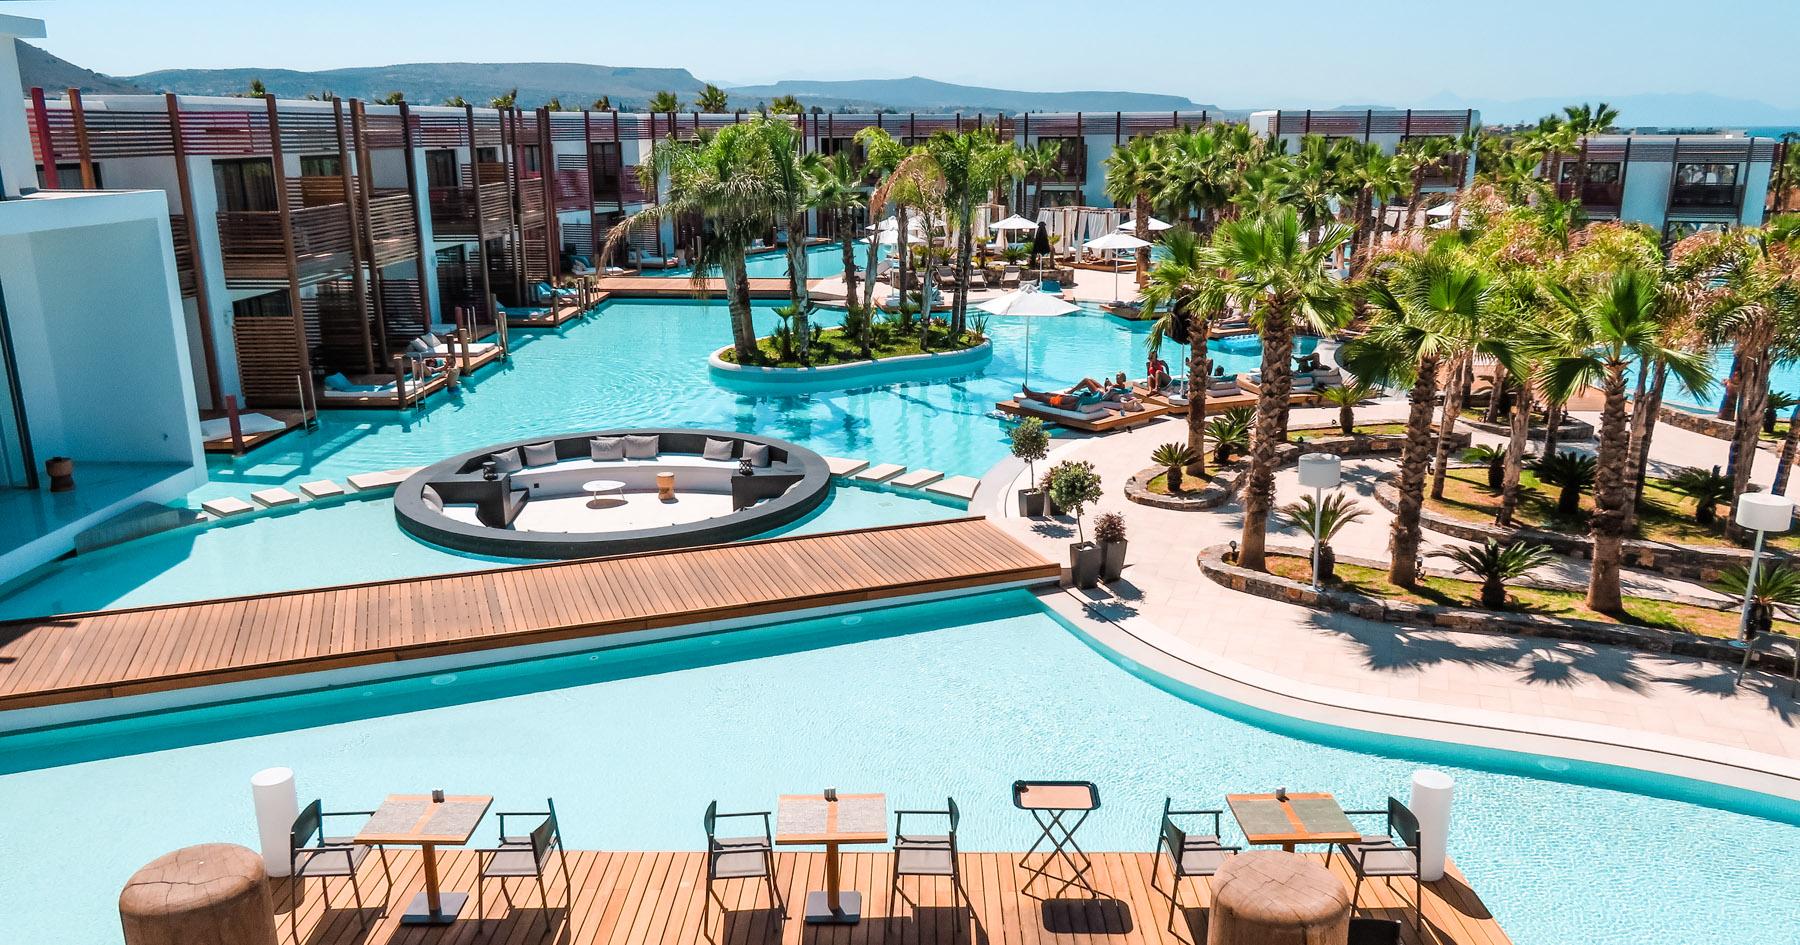 Stella Island Luxury Resort Kreta View